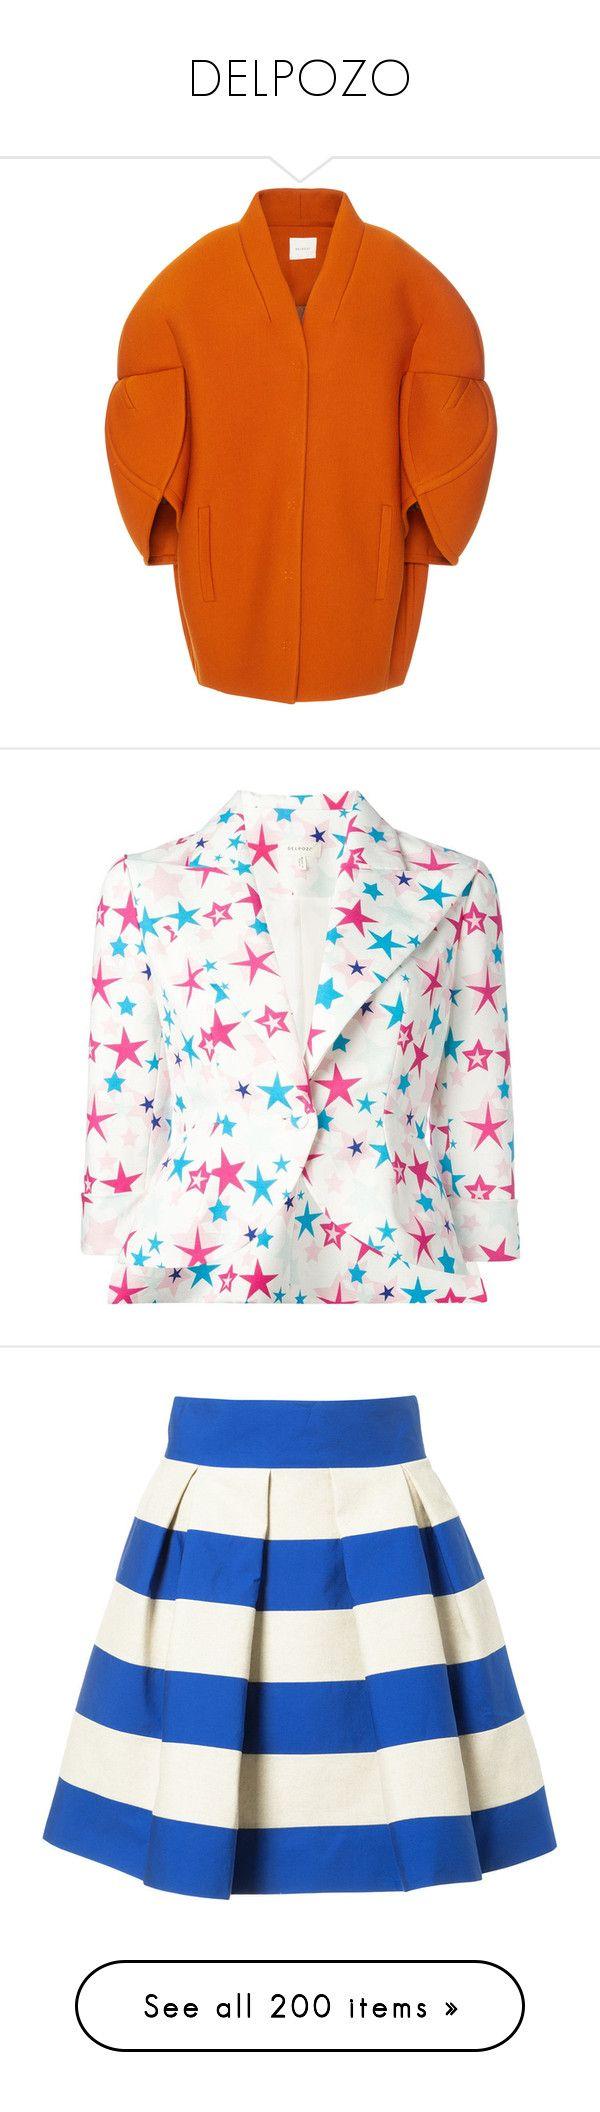 """DELPOZO"" by bliznec-anna ❤ liked on Polyvore featuring outerwear, coats, delpozo, coats & jackets, jackets, orange, cocoon coat, puff sleeve coat, orange coat and blazers"